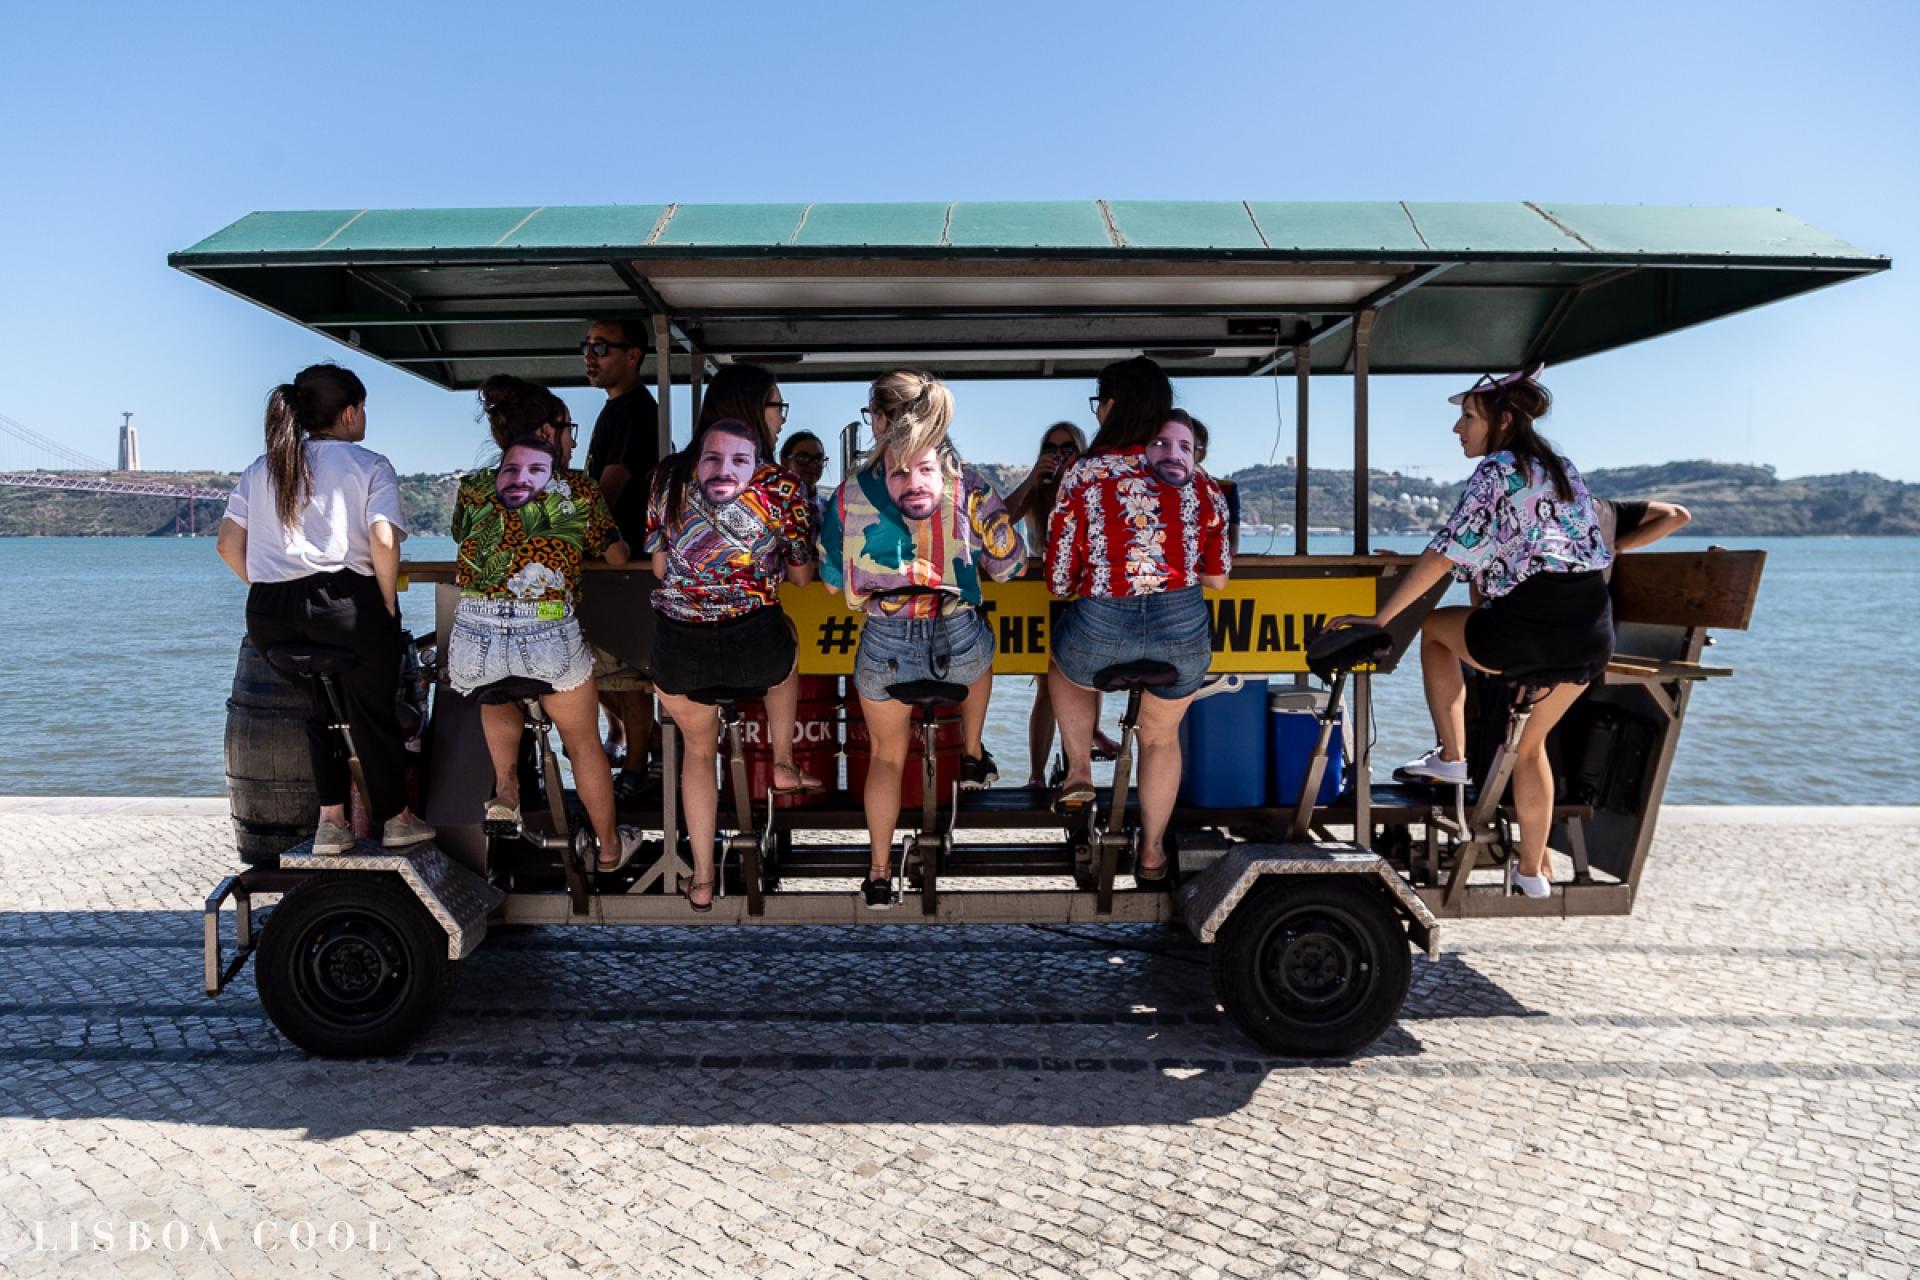 LisboaCool_Sair_Bike Bar Tours